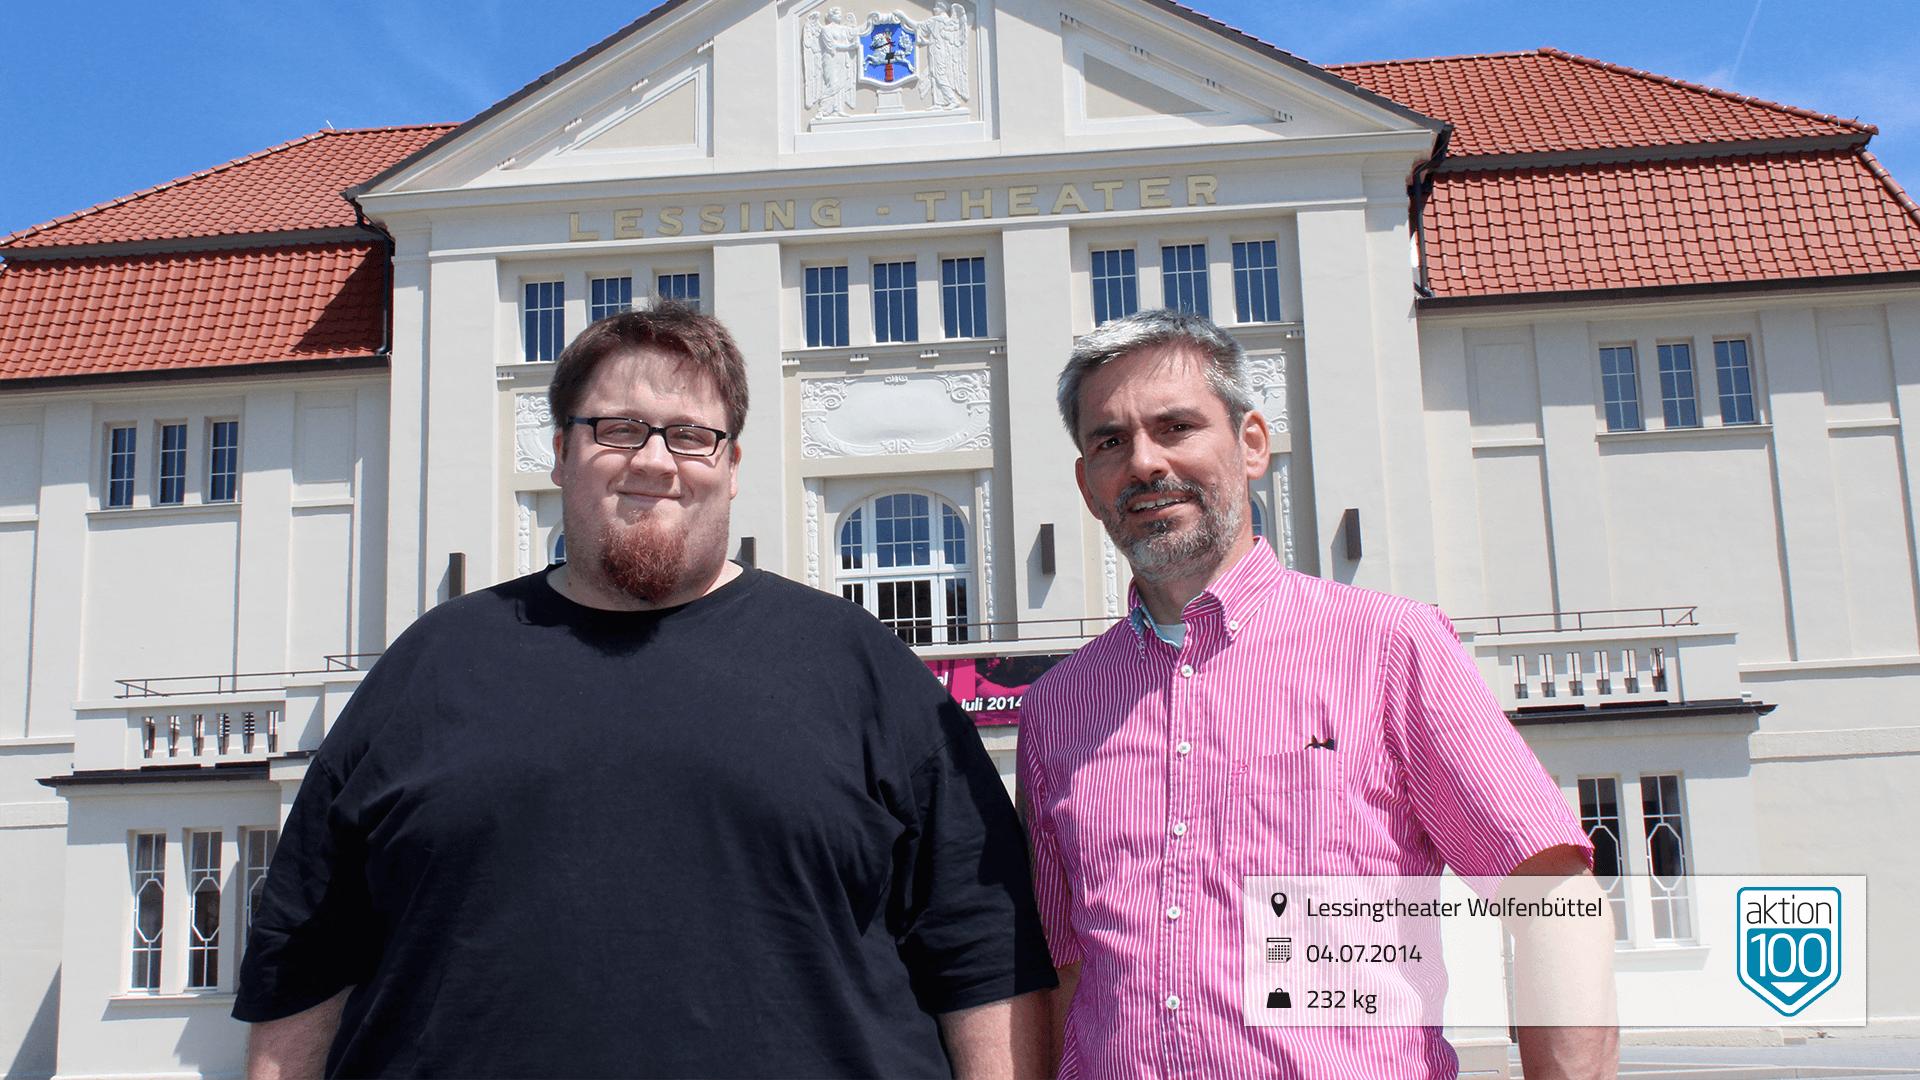 Motivator Stefan Brix vor dem Lessingtheater Wolfenbüttel Juli 2014